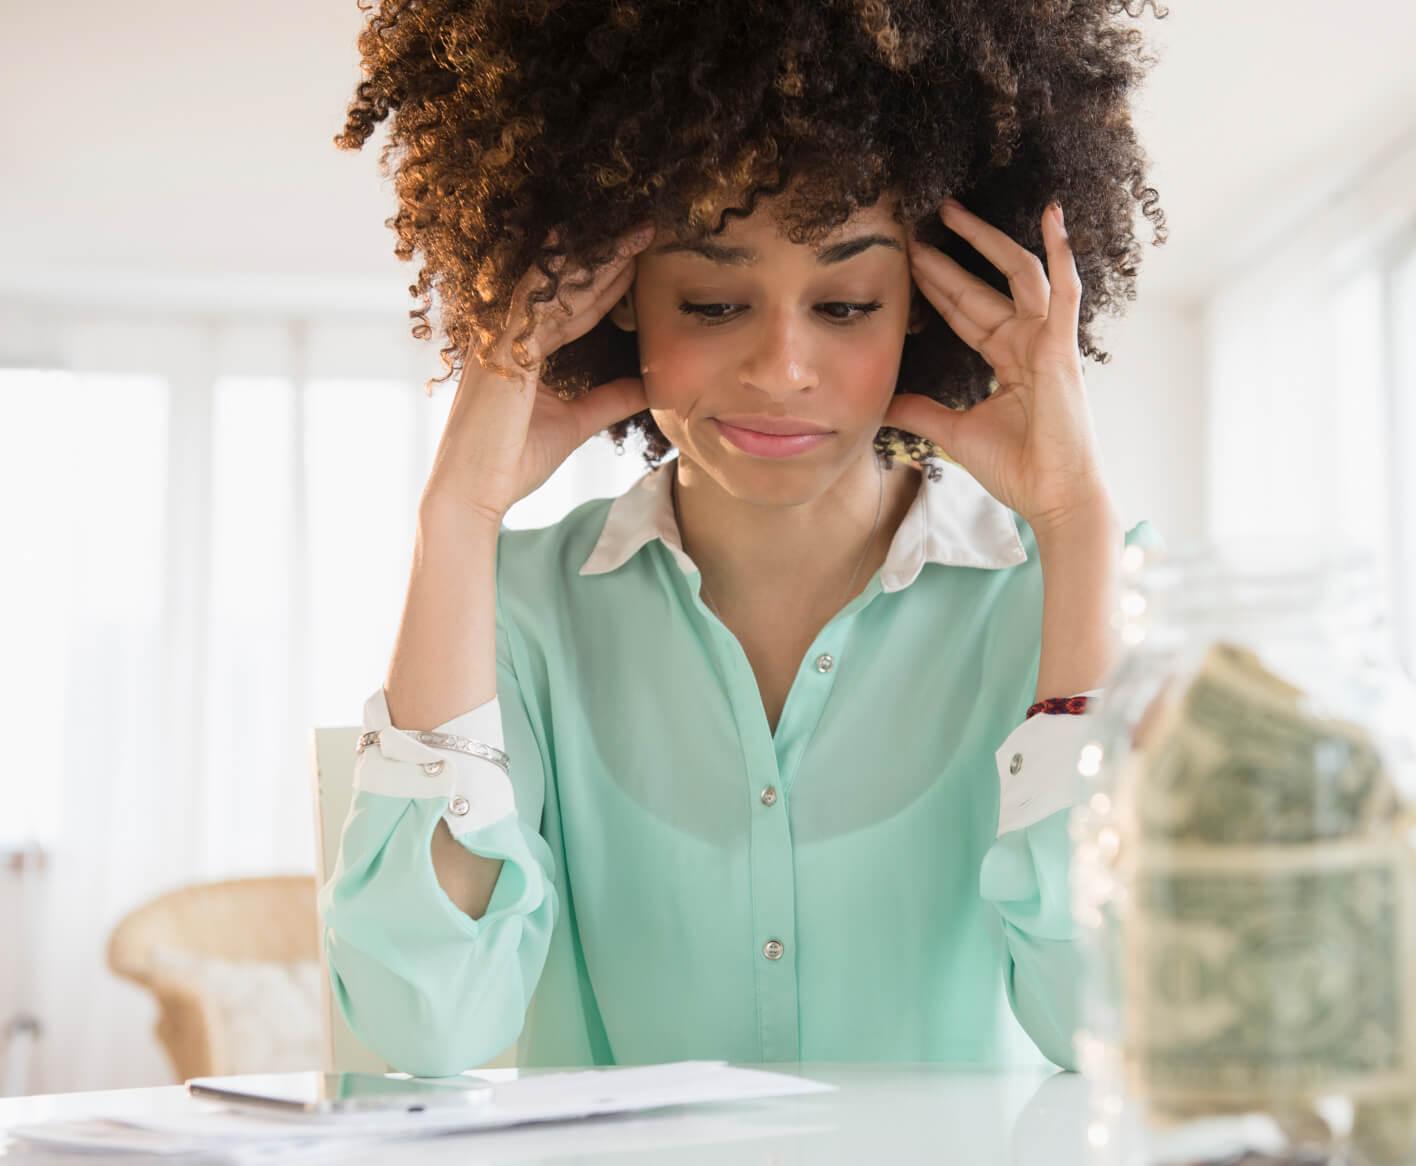 woman-distressed-budgeting